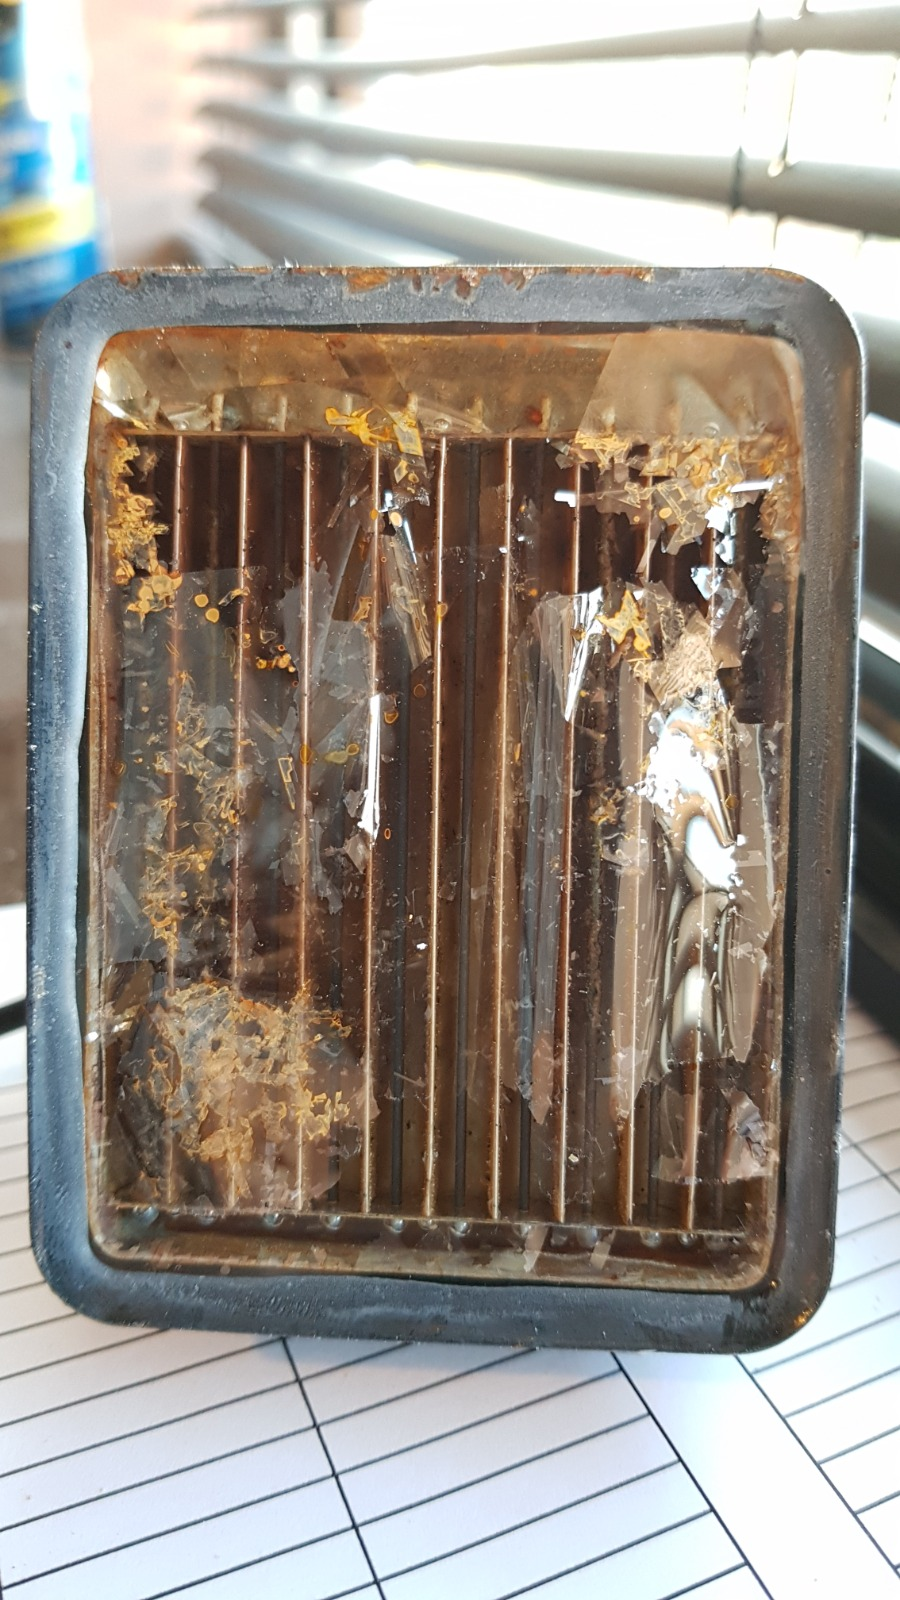 SBT-10A tube destroyed! - radmon org Forums